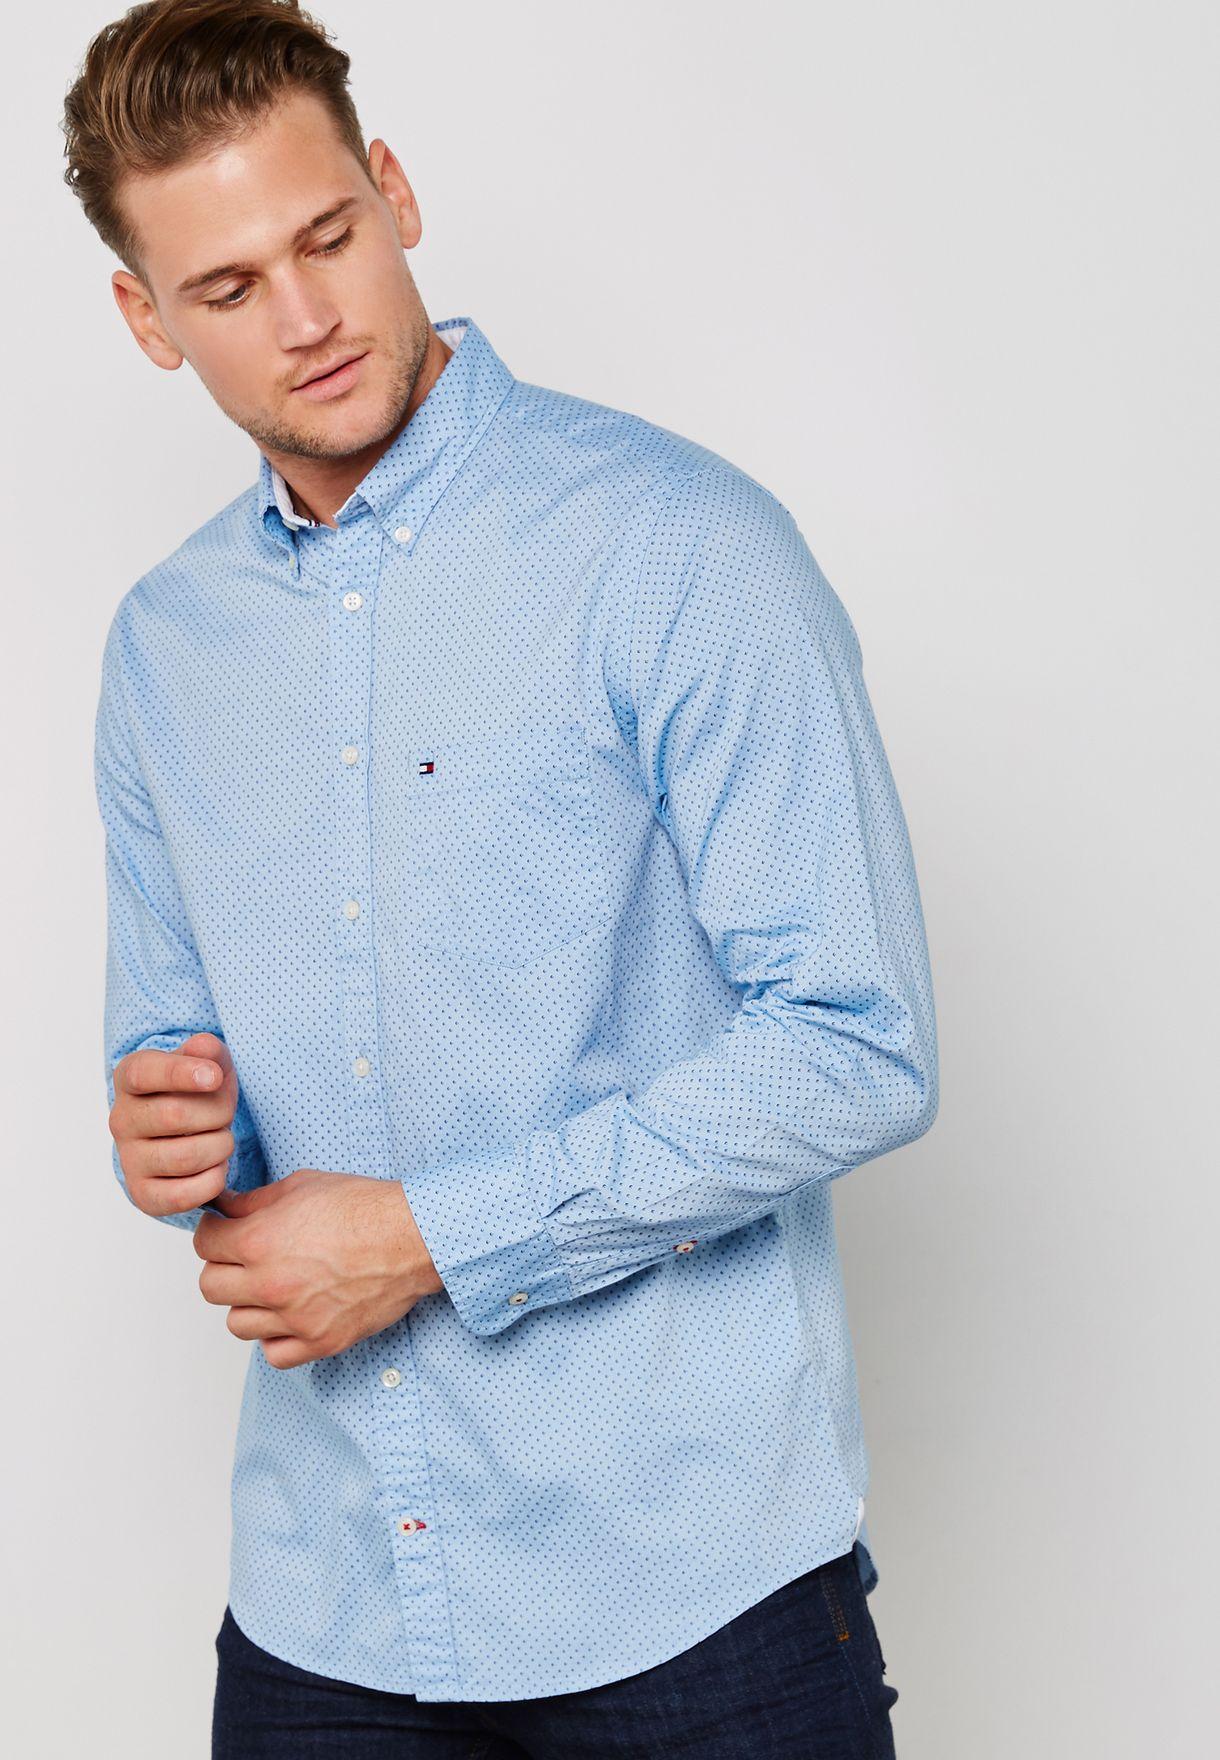 e7bb8b3c Shop Tommy Hilfiger blue Oxford Micro Print Shirt MW0MW08427903 for ...